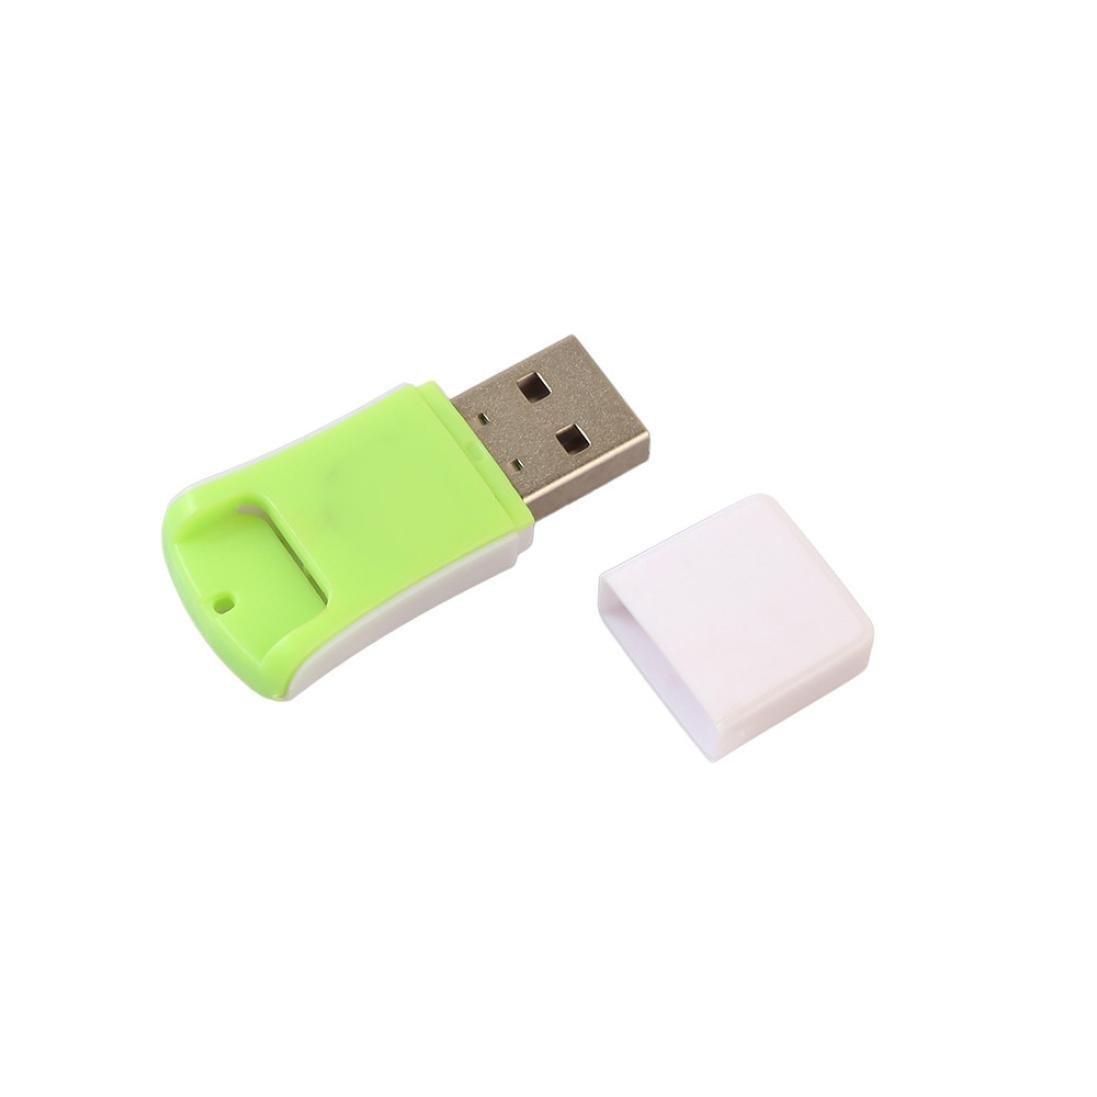 Dreamyth New Micro USB 2.0 Mini Card Reader Reader SD TF T-Flash High Speed Portable (green)